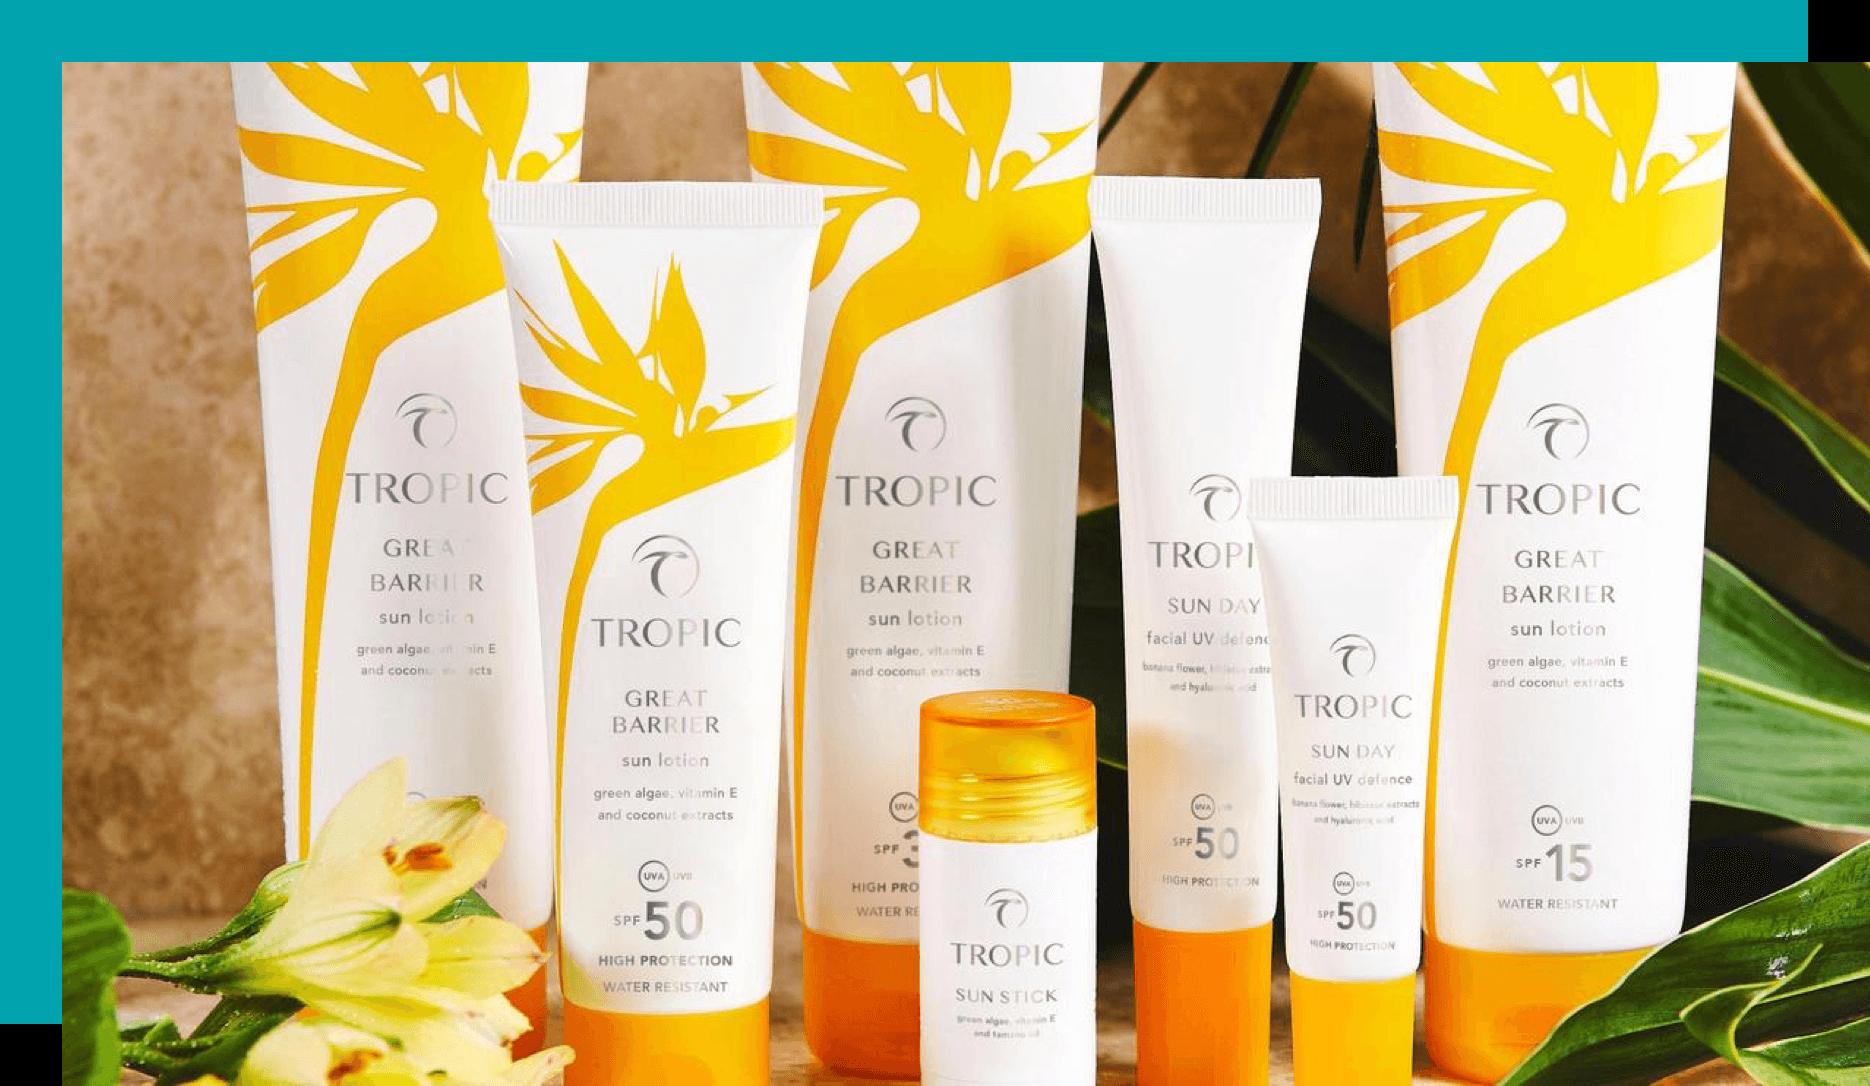 Tropic Skincare Eastside Co